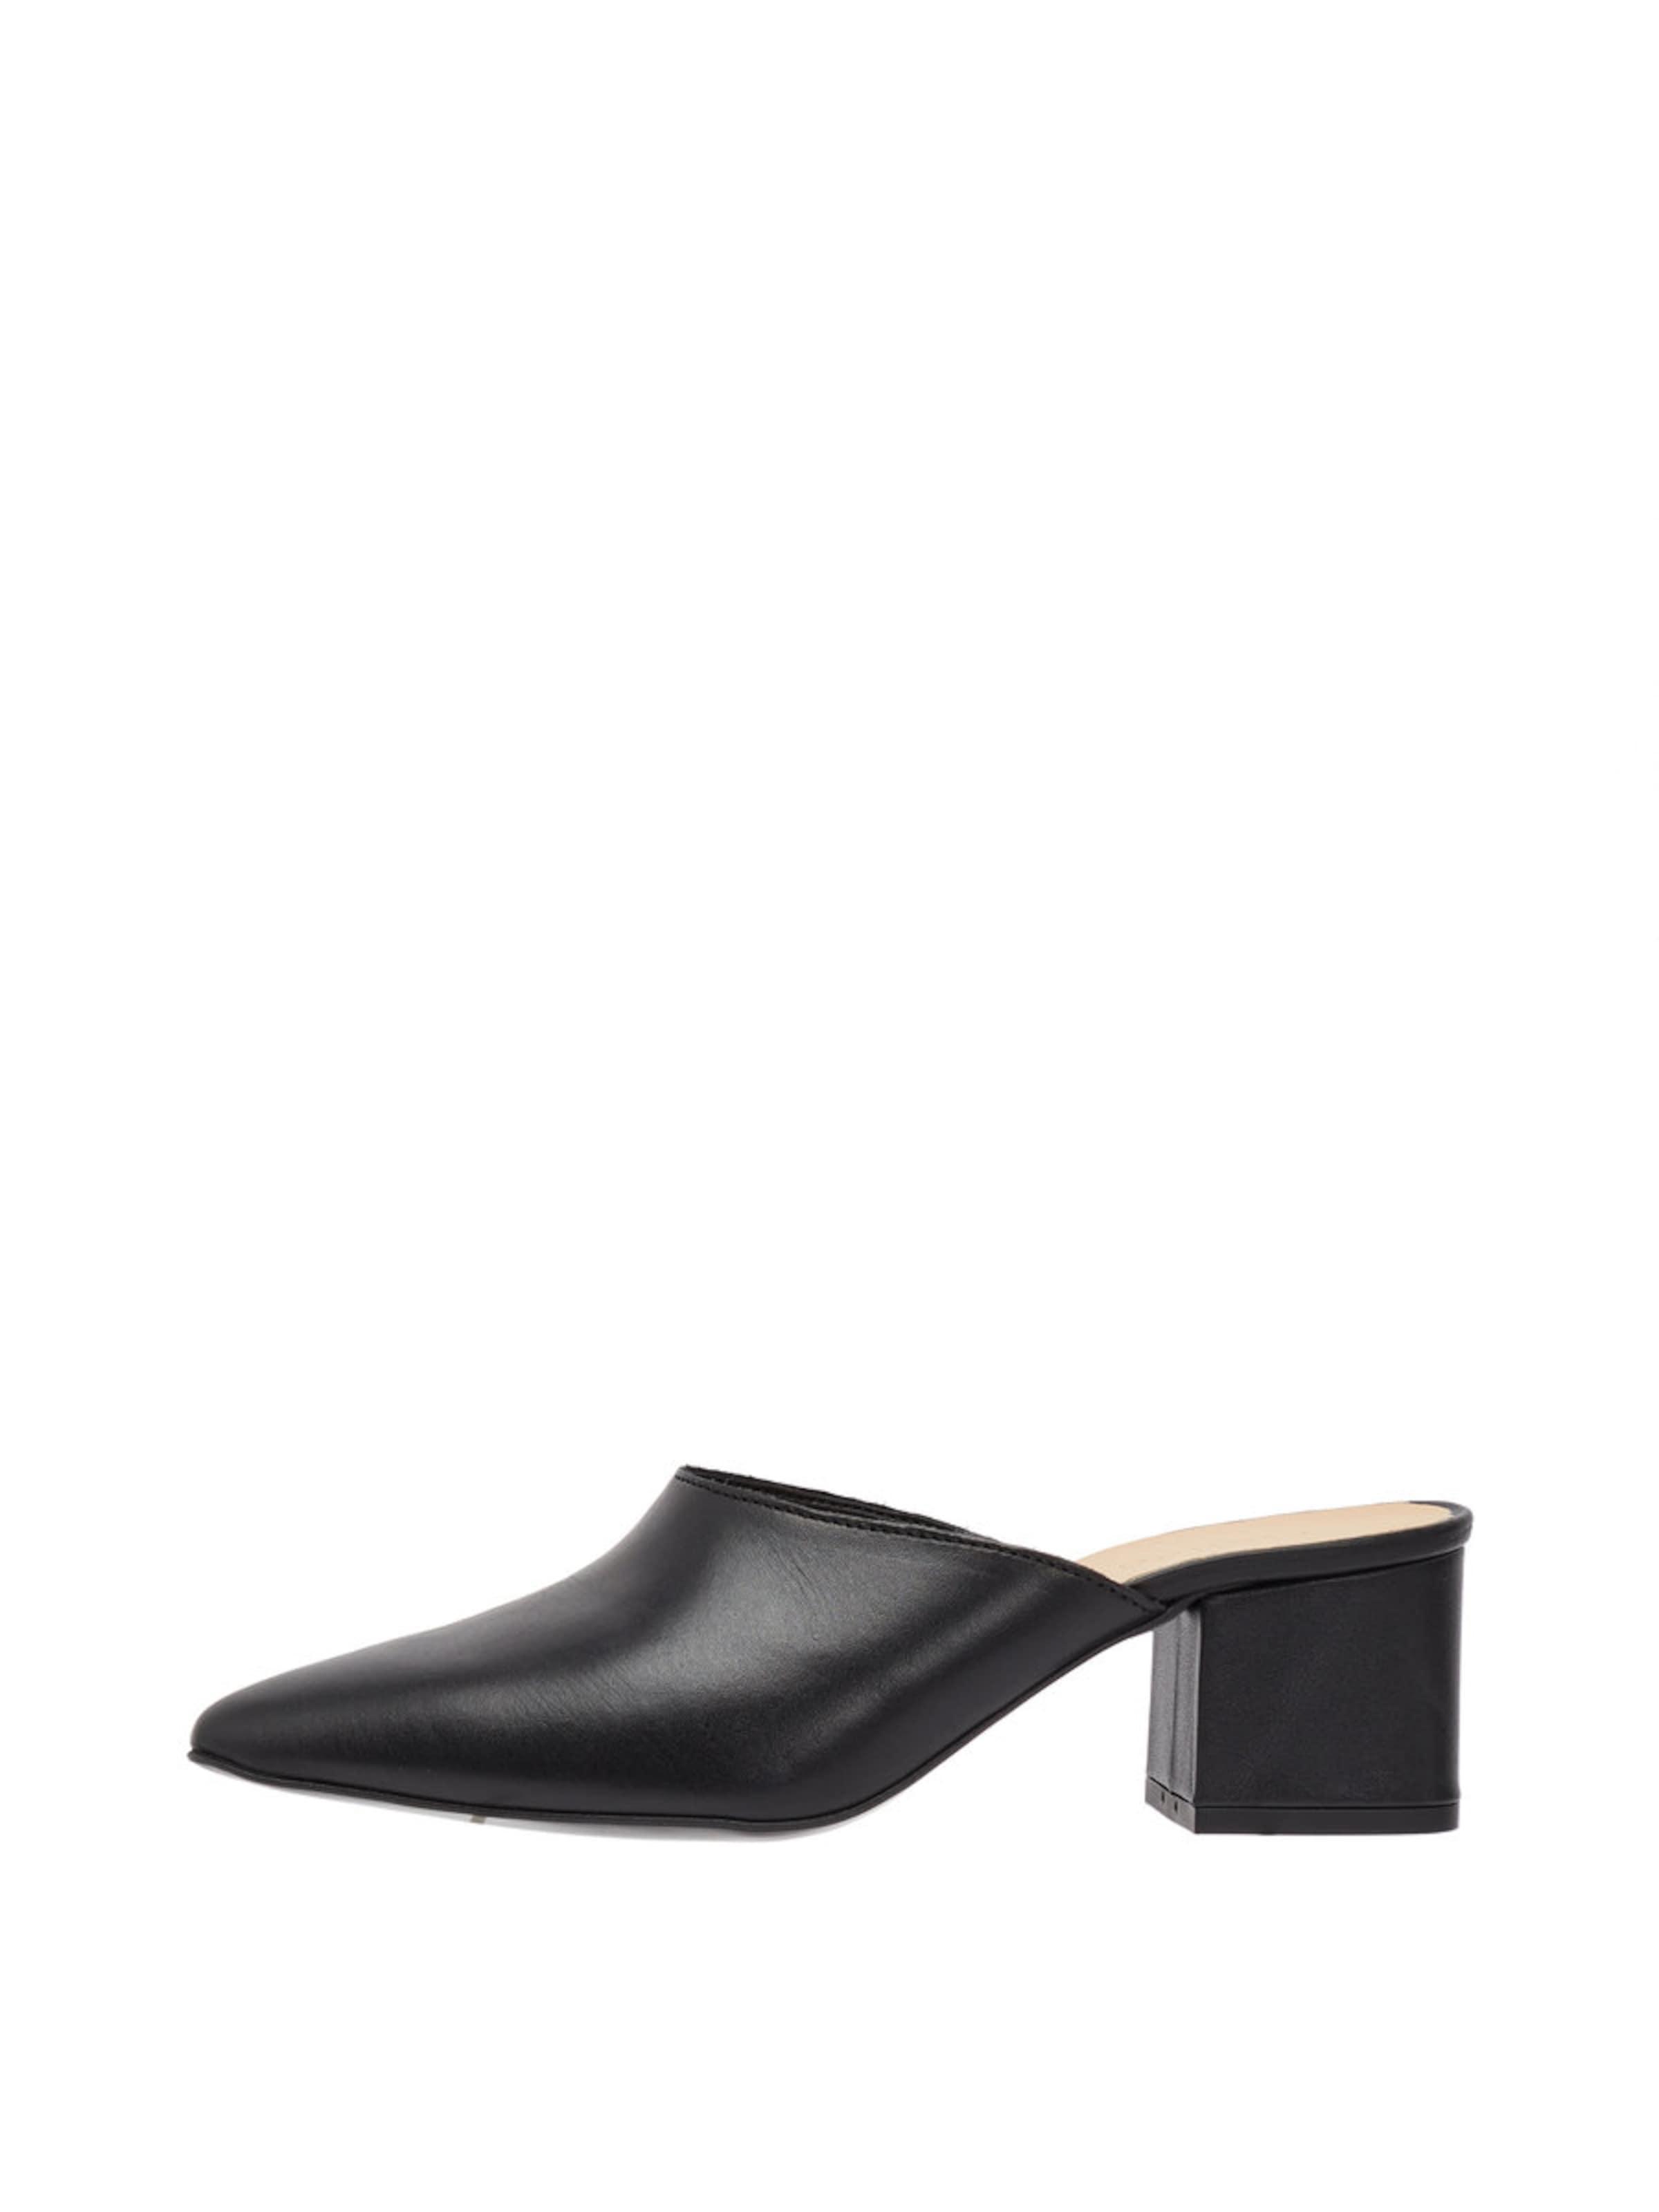 Haltbare Mode billige Schuhe Bianco | Schuhe Pantolette Schuhe Gut getragene Schuhe | ca704e